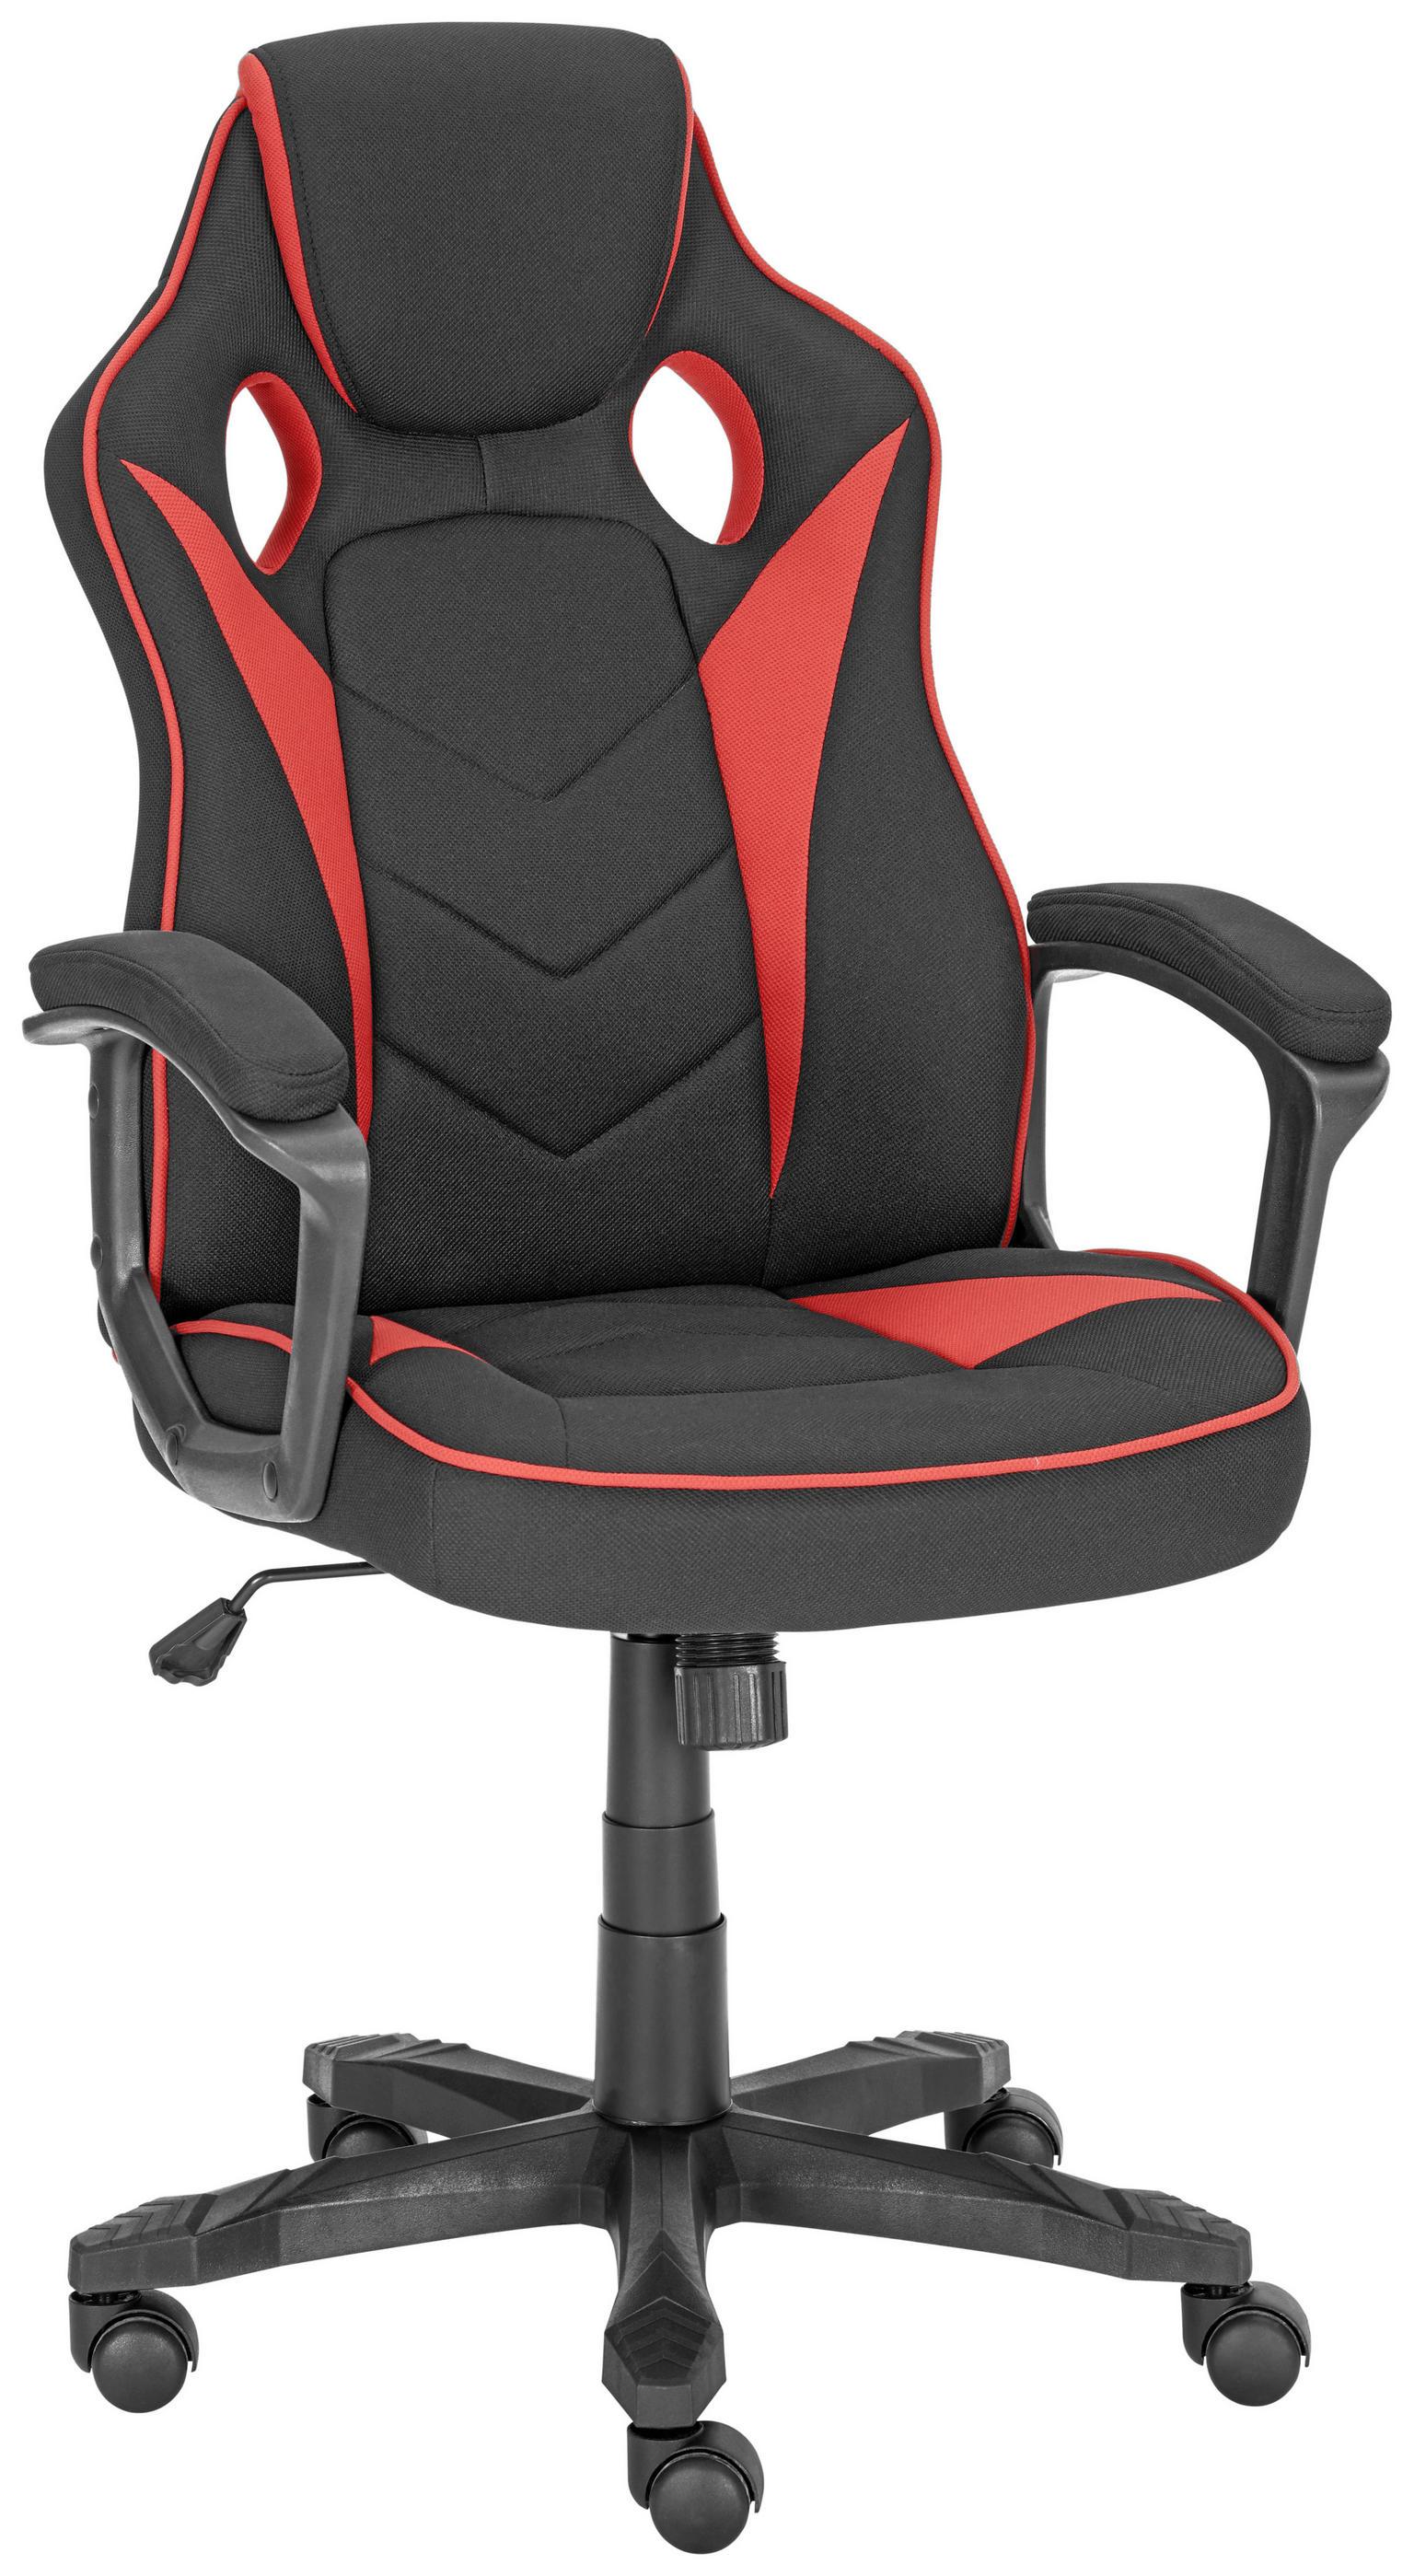 Xora Gamingstuhl (schwarz/rot)